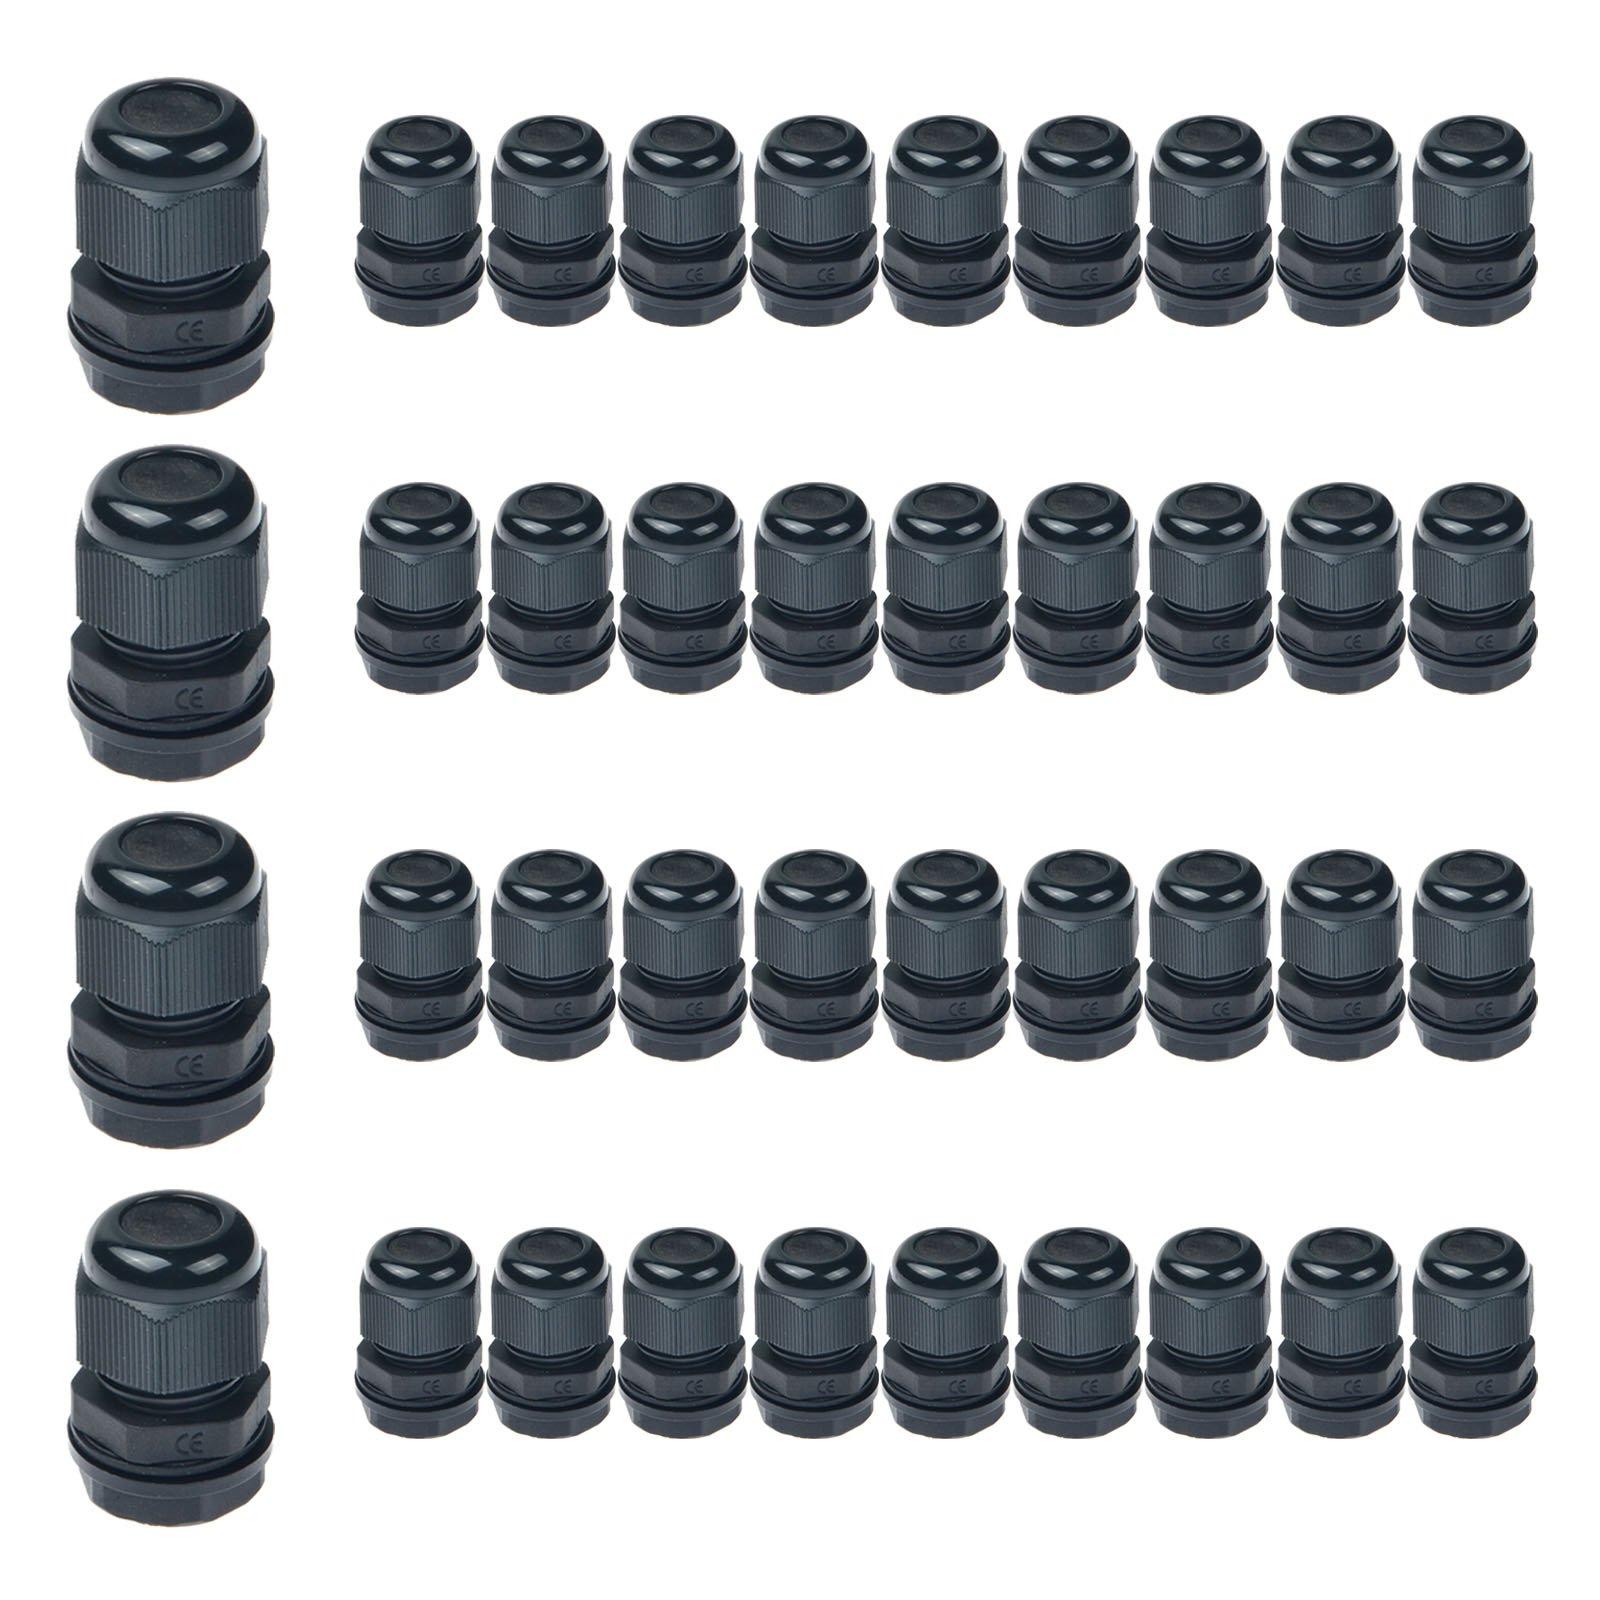 Nineleaf 40PK Black Compression Cable Gland Adjustable 6 - 12mm Joint Cable Connector, Higher Weatherproof Rating of IP66